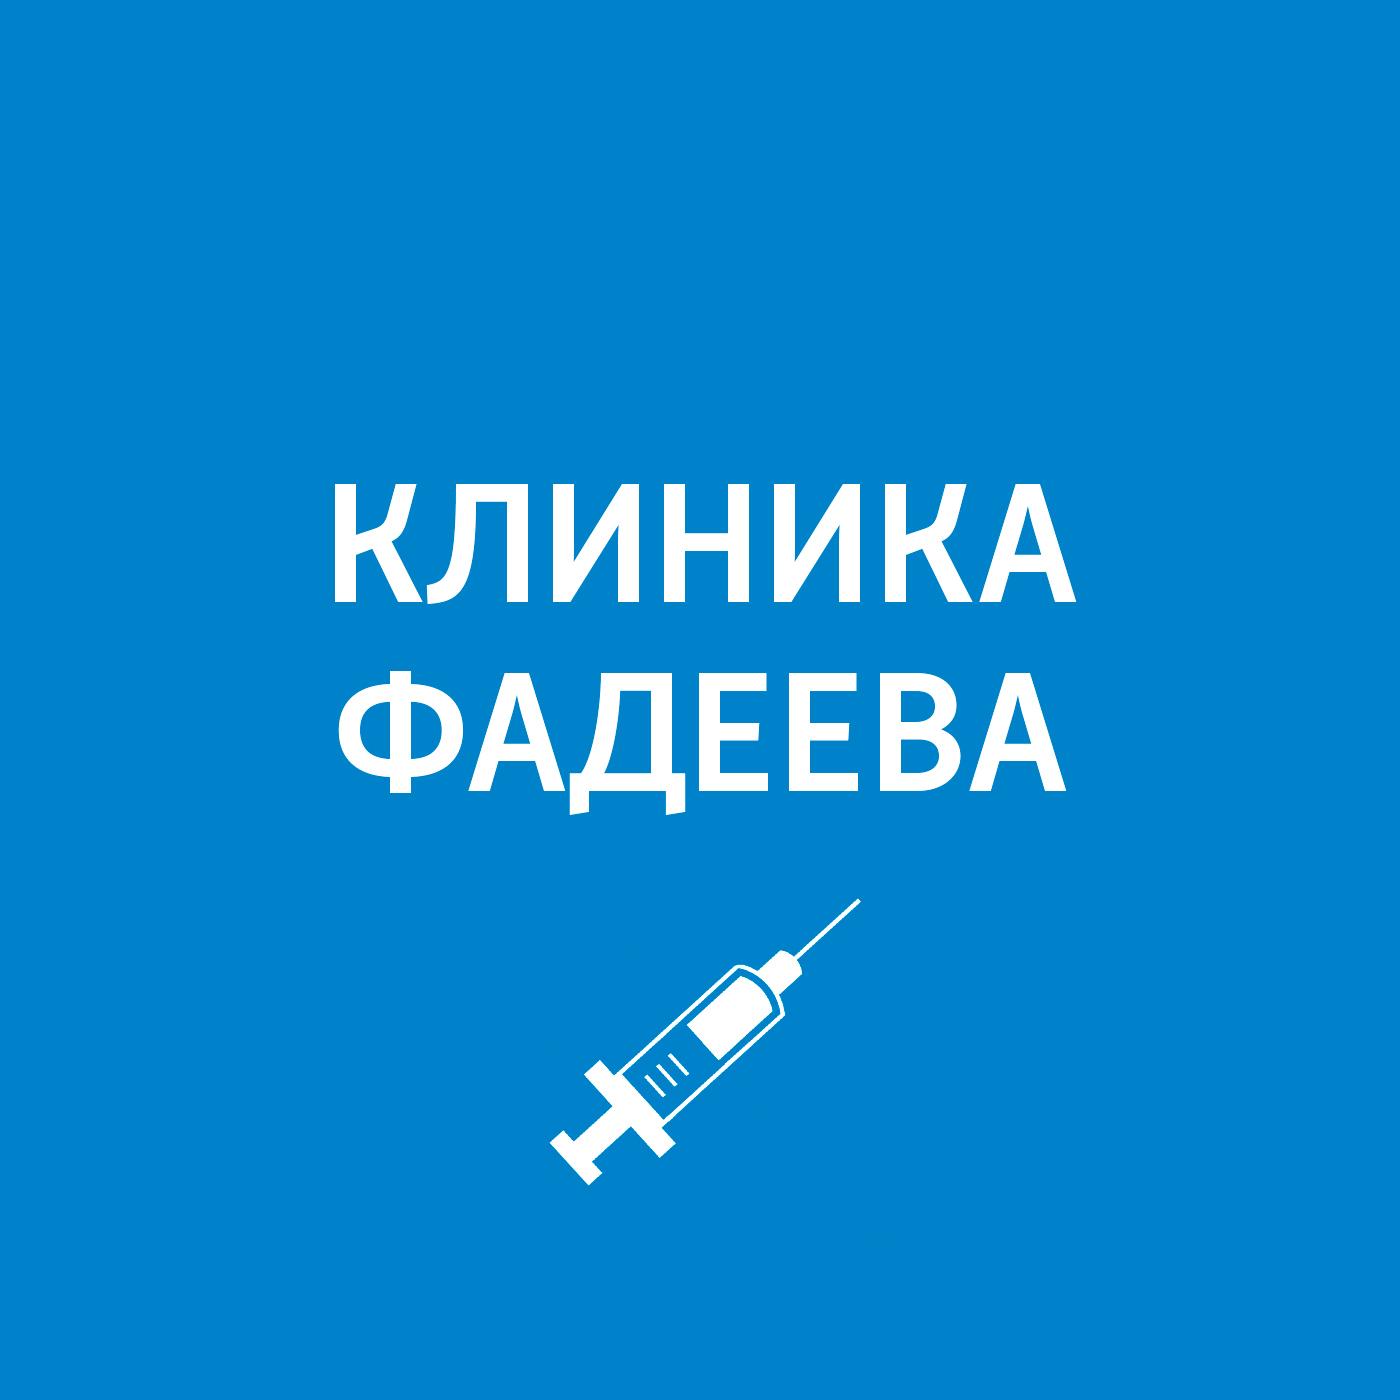 Пётр Фадеев Врач-логопед пётр фадеев кинезиолог остеопат